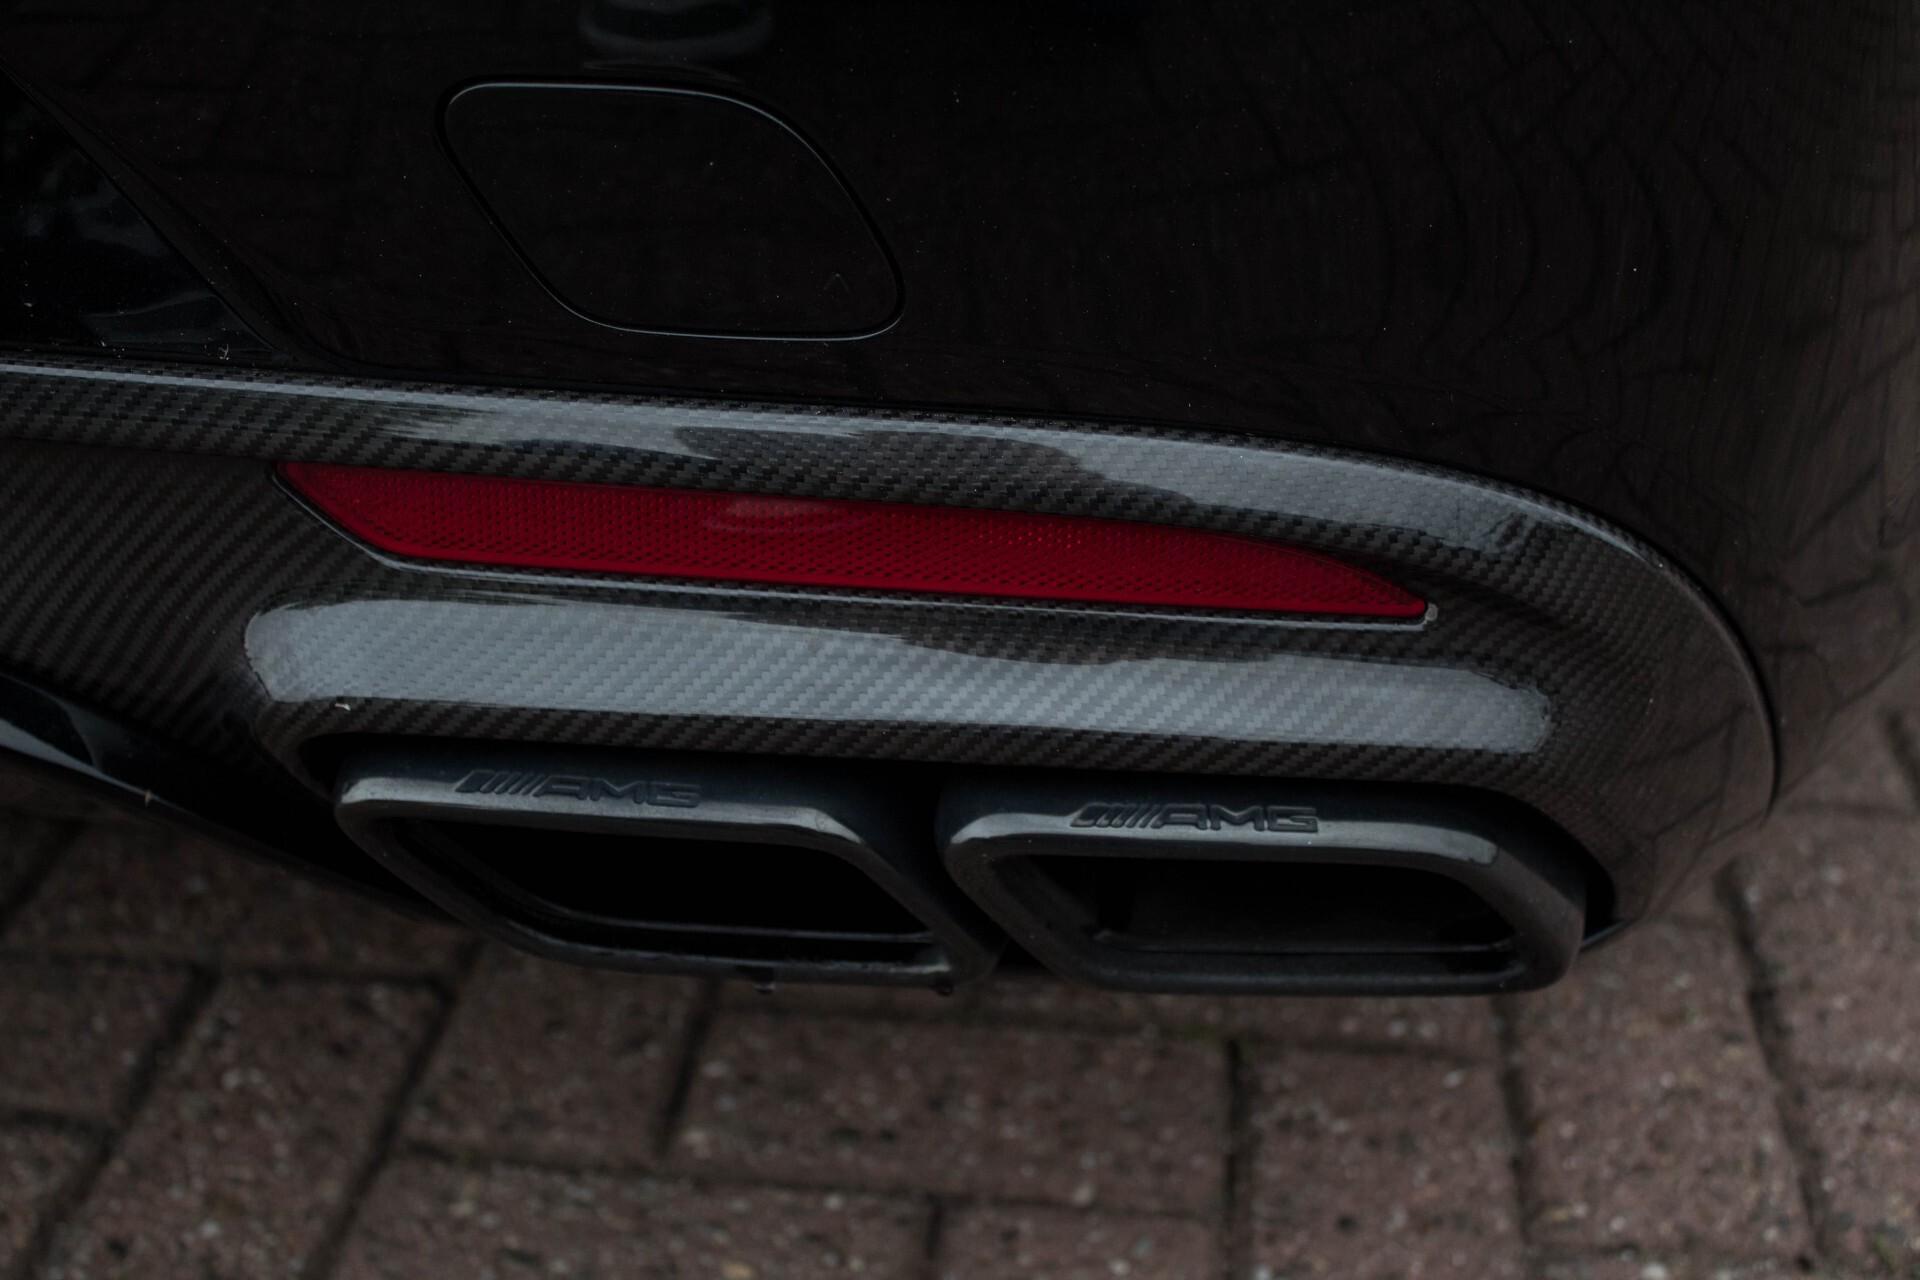 Mercedes-Benz S-Klasse Cabrio 63 AMG 4-M Ceramic/Designo/Carbon/Burmester High End Aut Foto 62